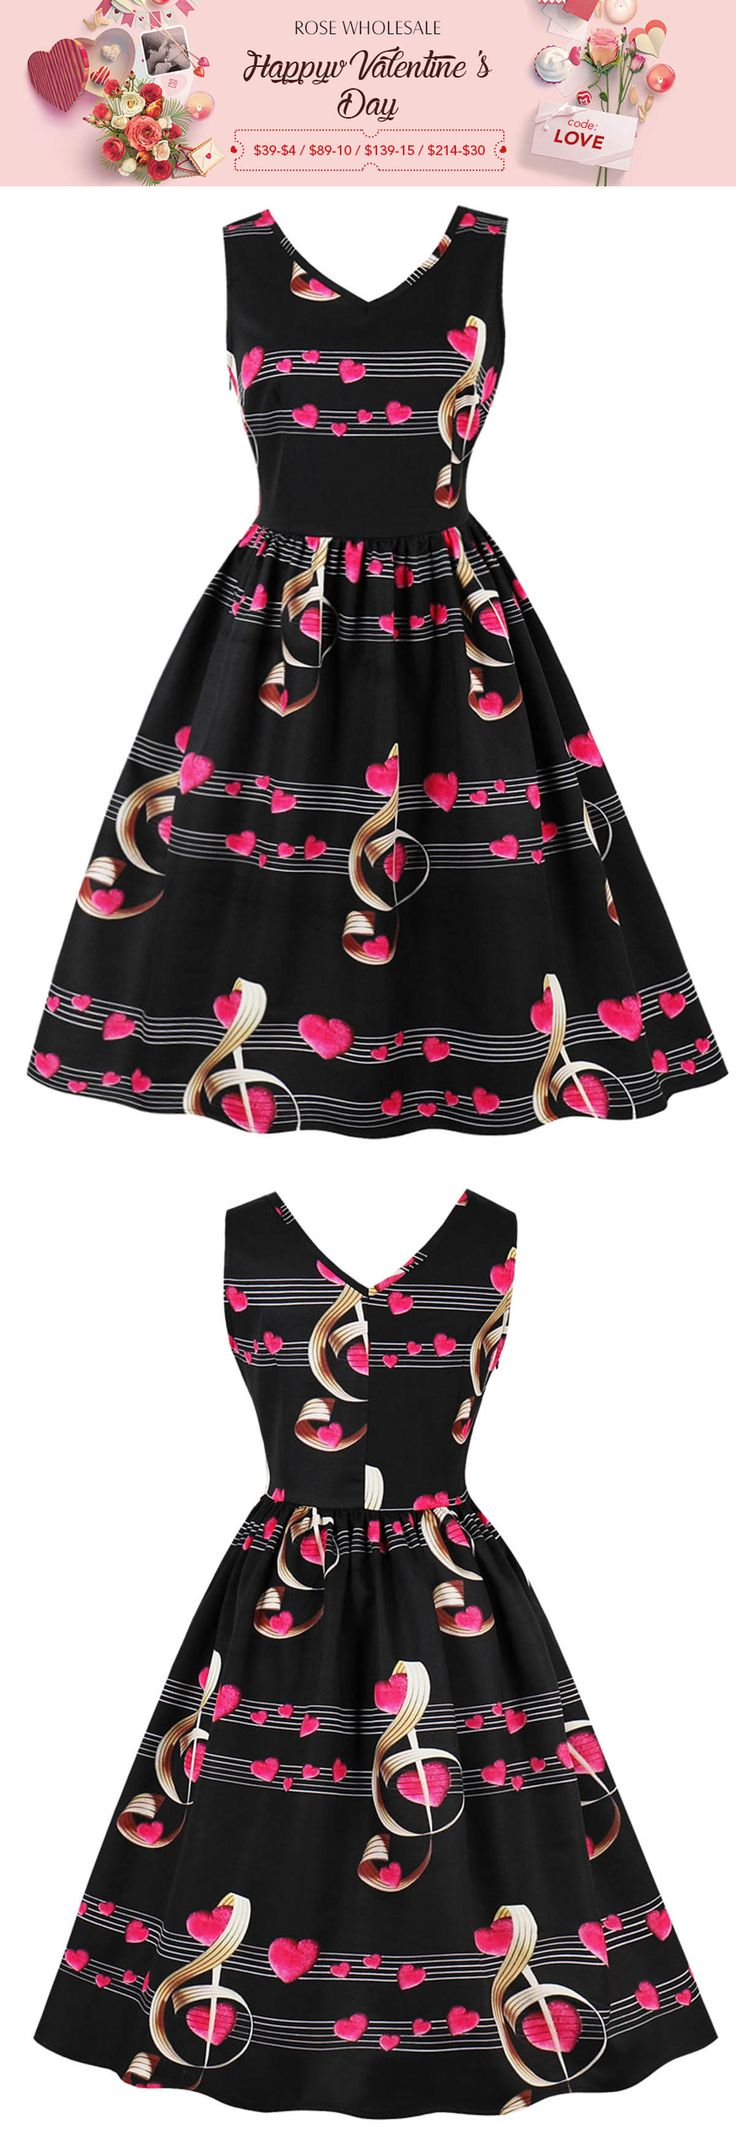 $13.99,Plus Size Heart Musical Note Print Retro Dress - Black 4xl | Rosewholesale,rosewholesale.com,rosewholesale clothes,rosewholesale.com clothing,rosewholesale dress,rosewholesale dress vintage,rosewholesale valentines day,valentines day outfit,valentines day dress,vintage dress,prom dress.party dress,plus size,rosewholesale dress plus size,heart,music print | #rosewholesae #dress #vintage #plussize